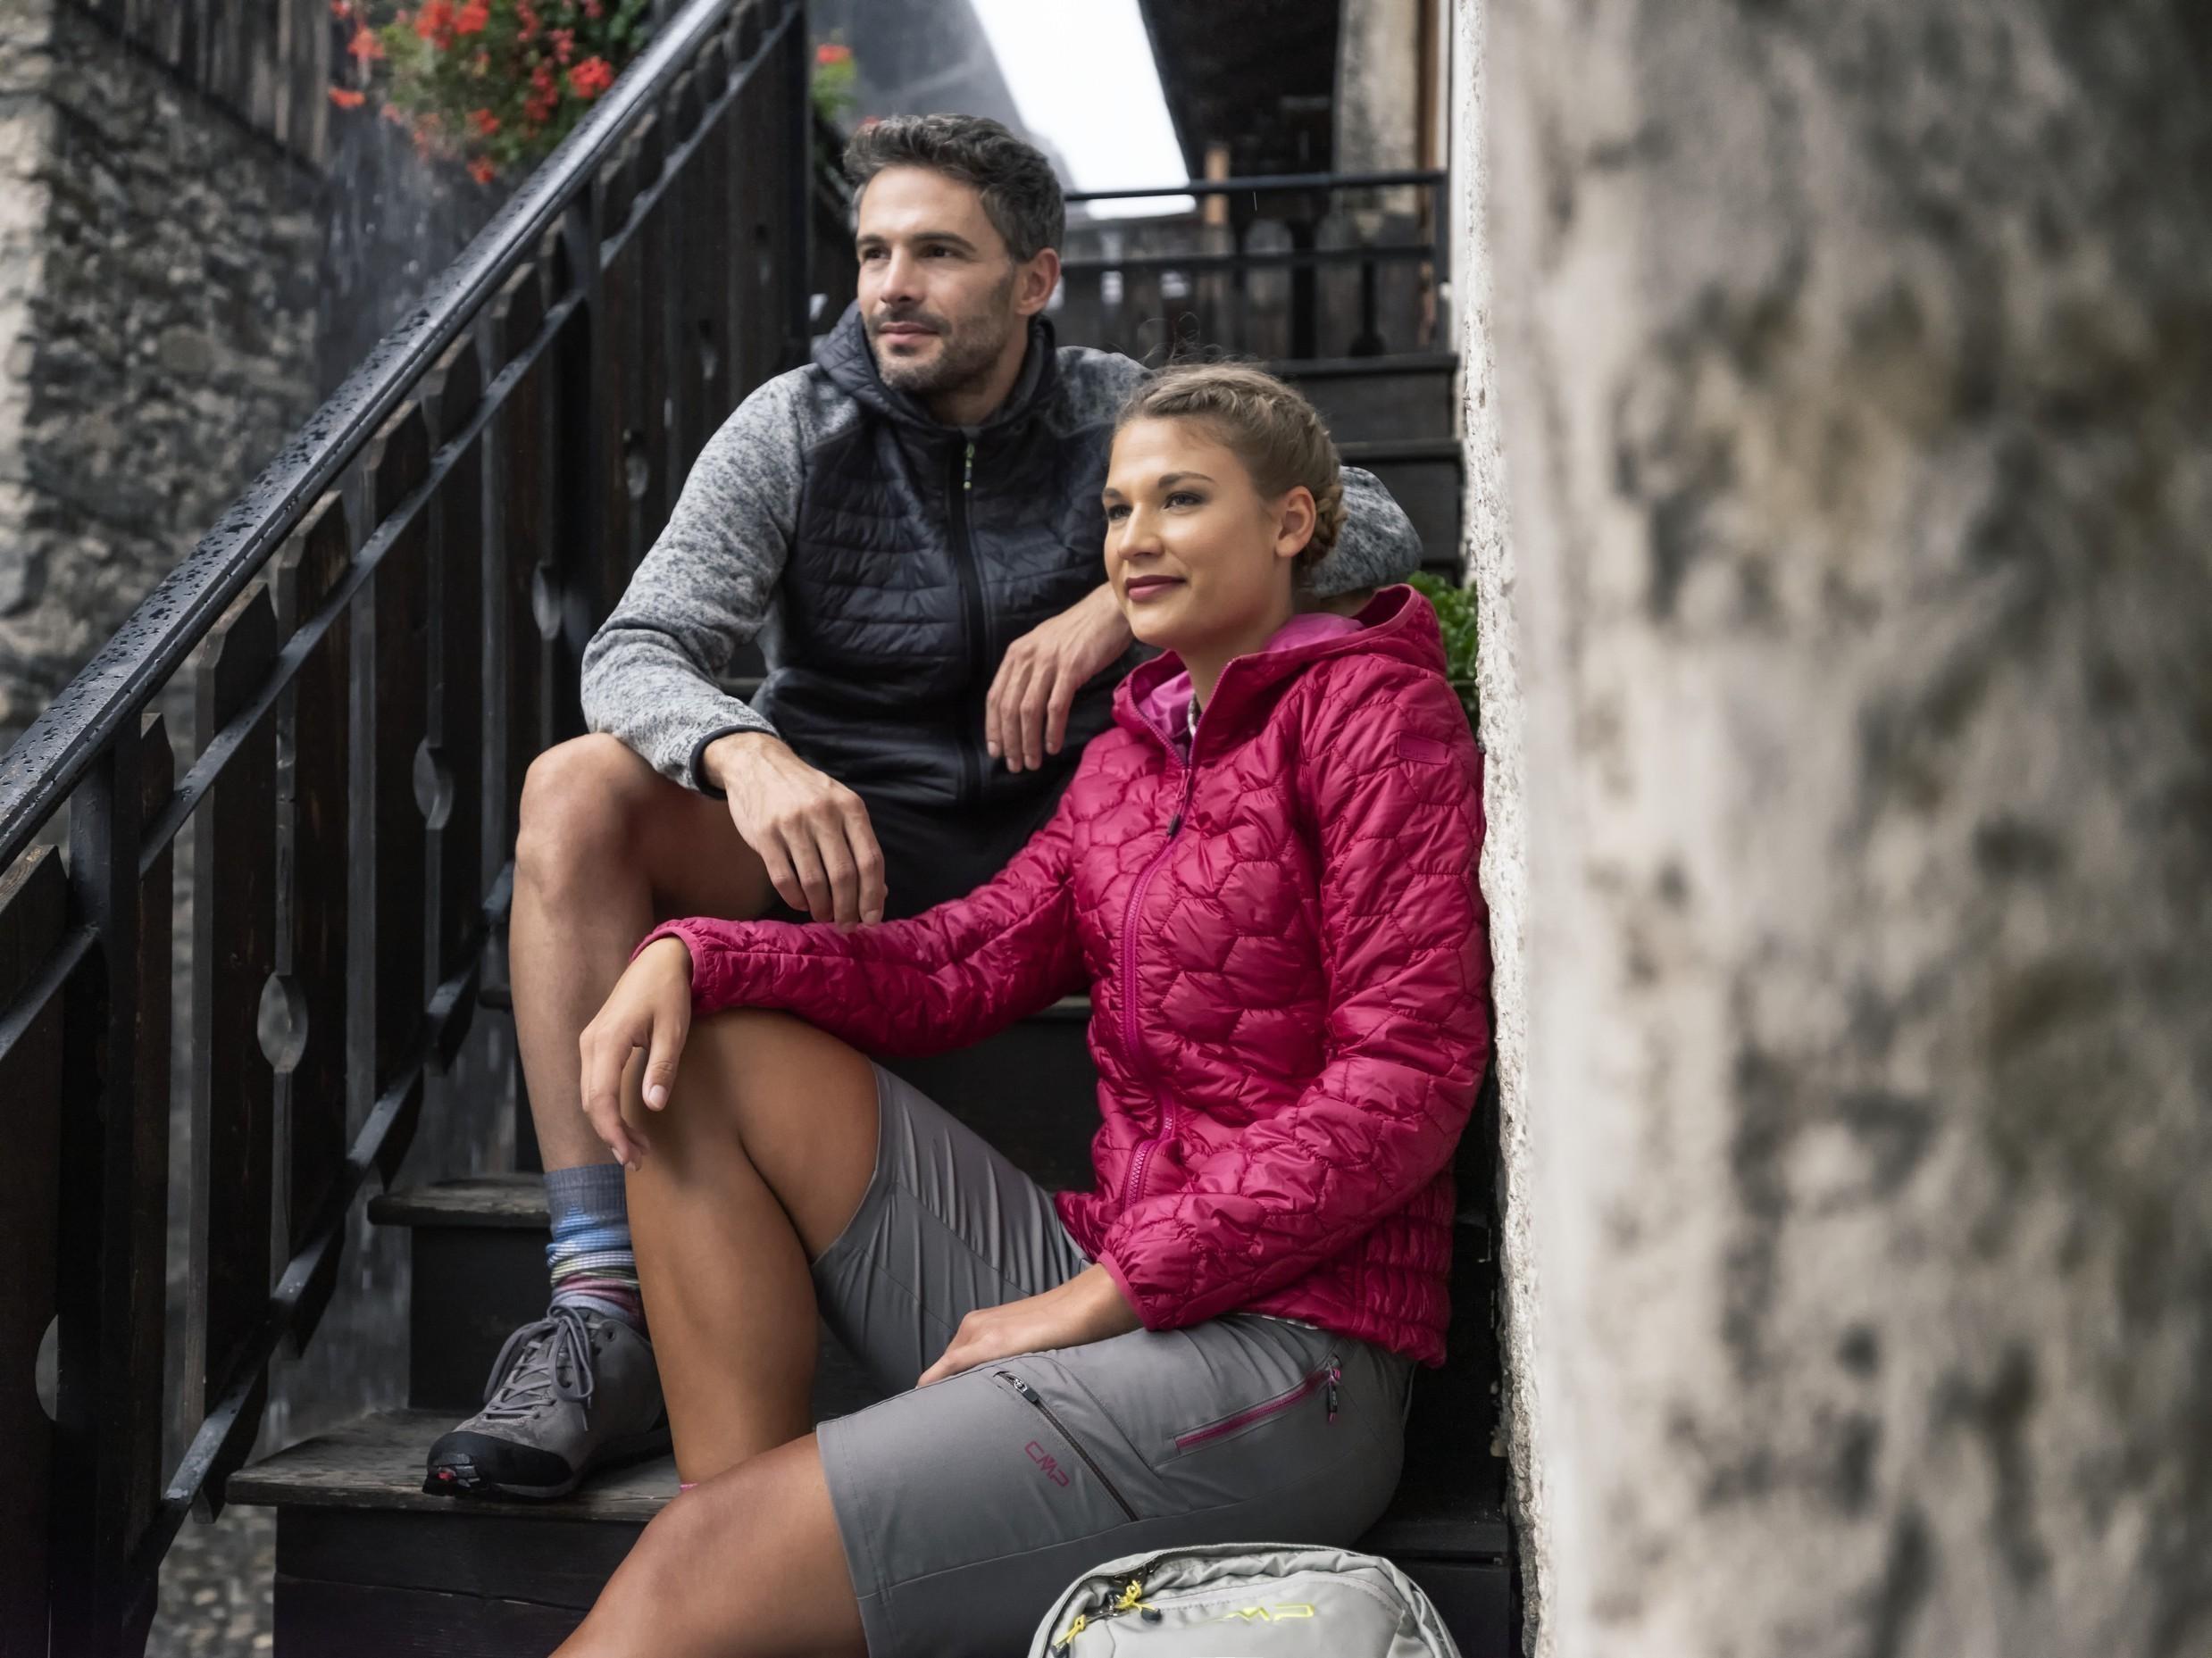 Schuh Marke Sport Outdoor Bekleidung